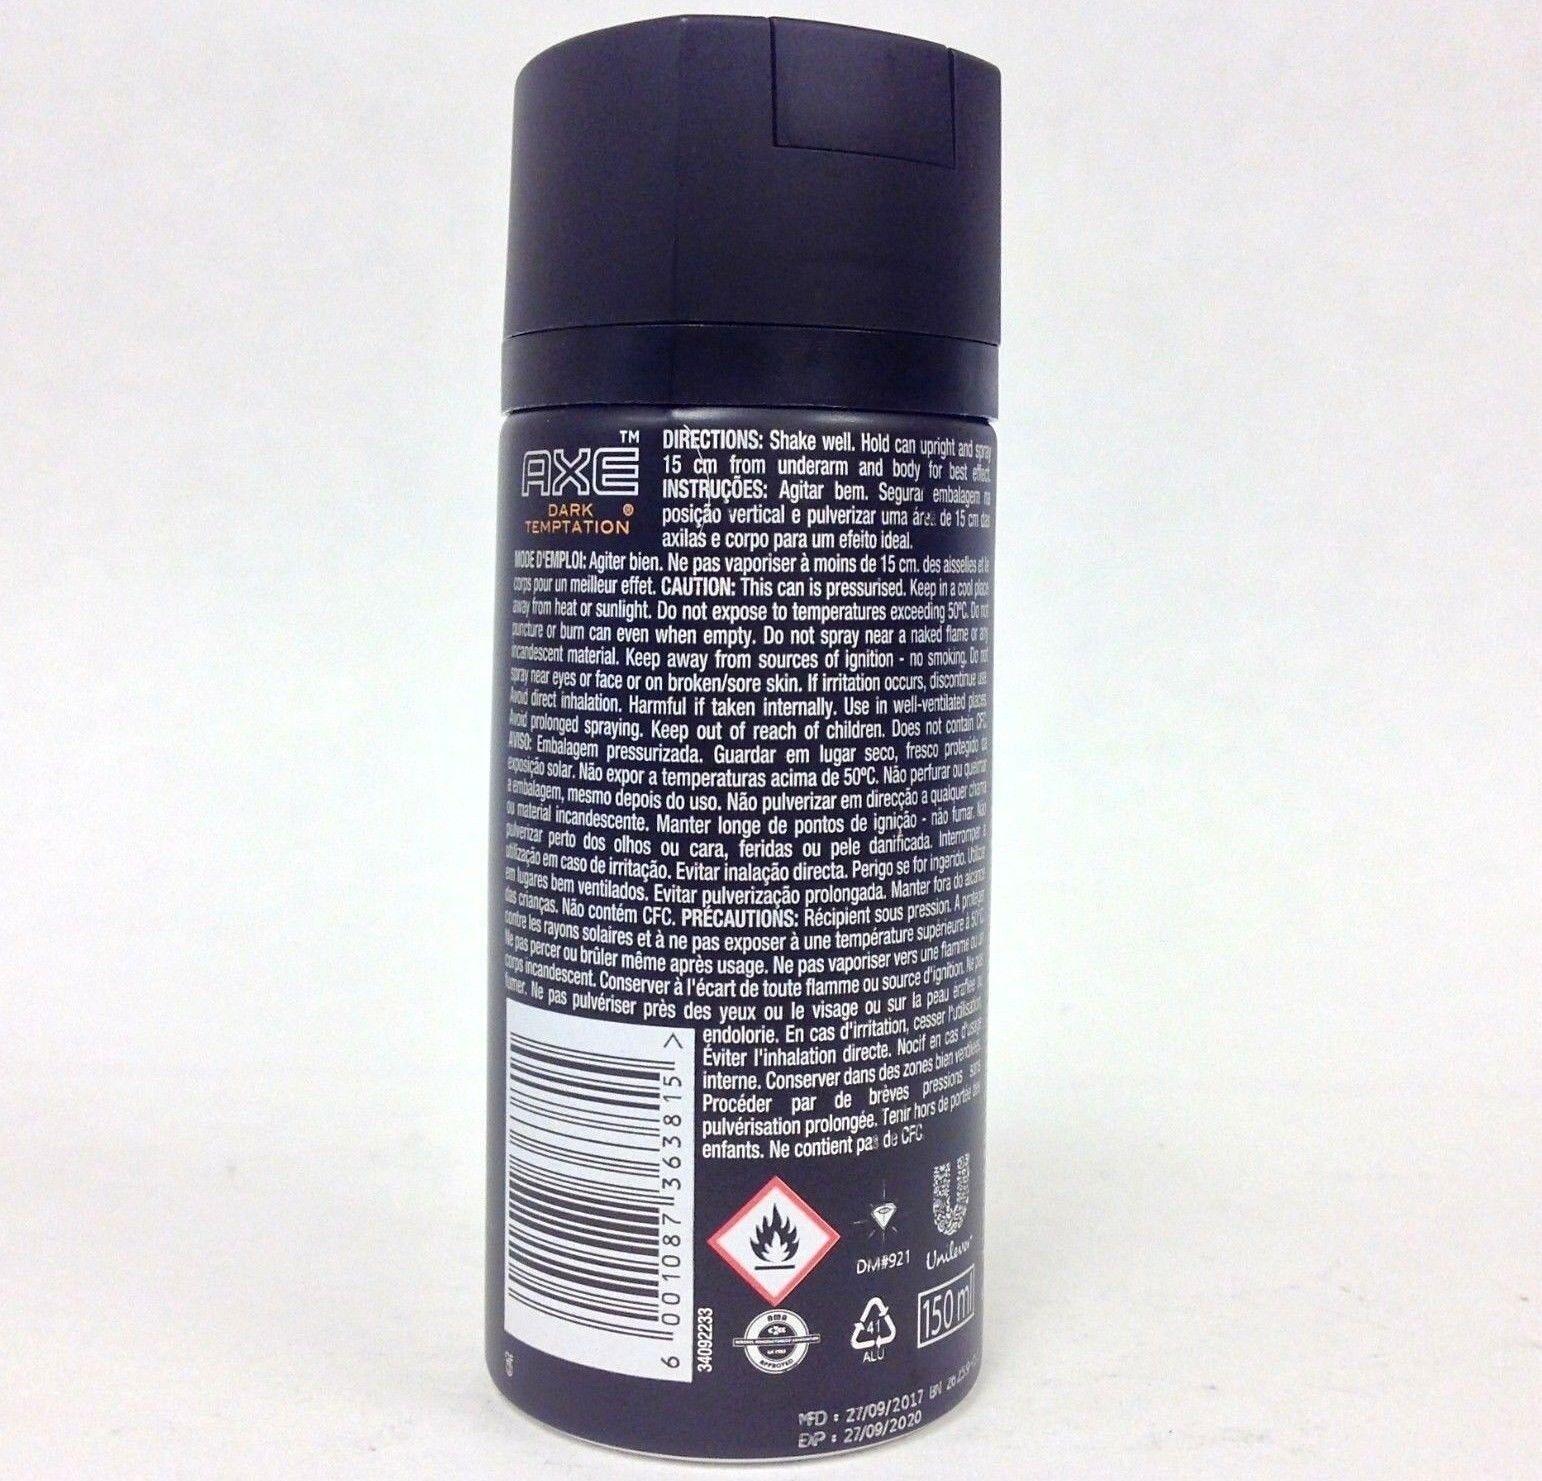 AXE Dark Temptation Deodorant Body Spray 5oz